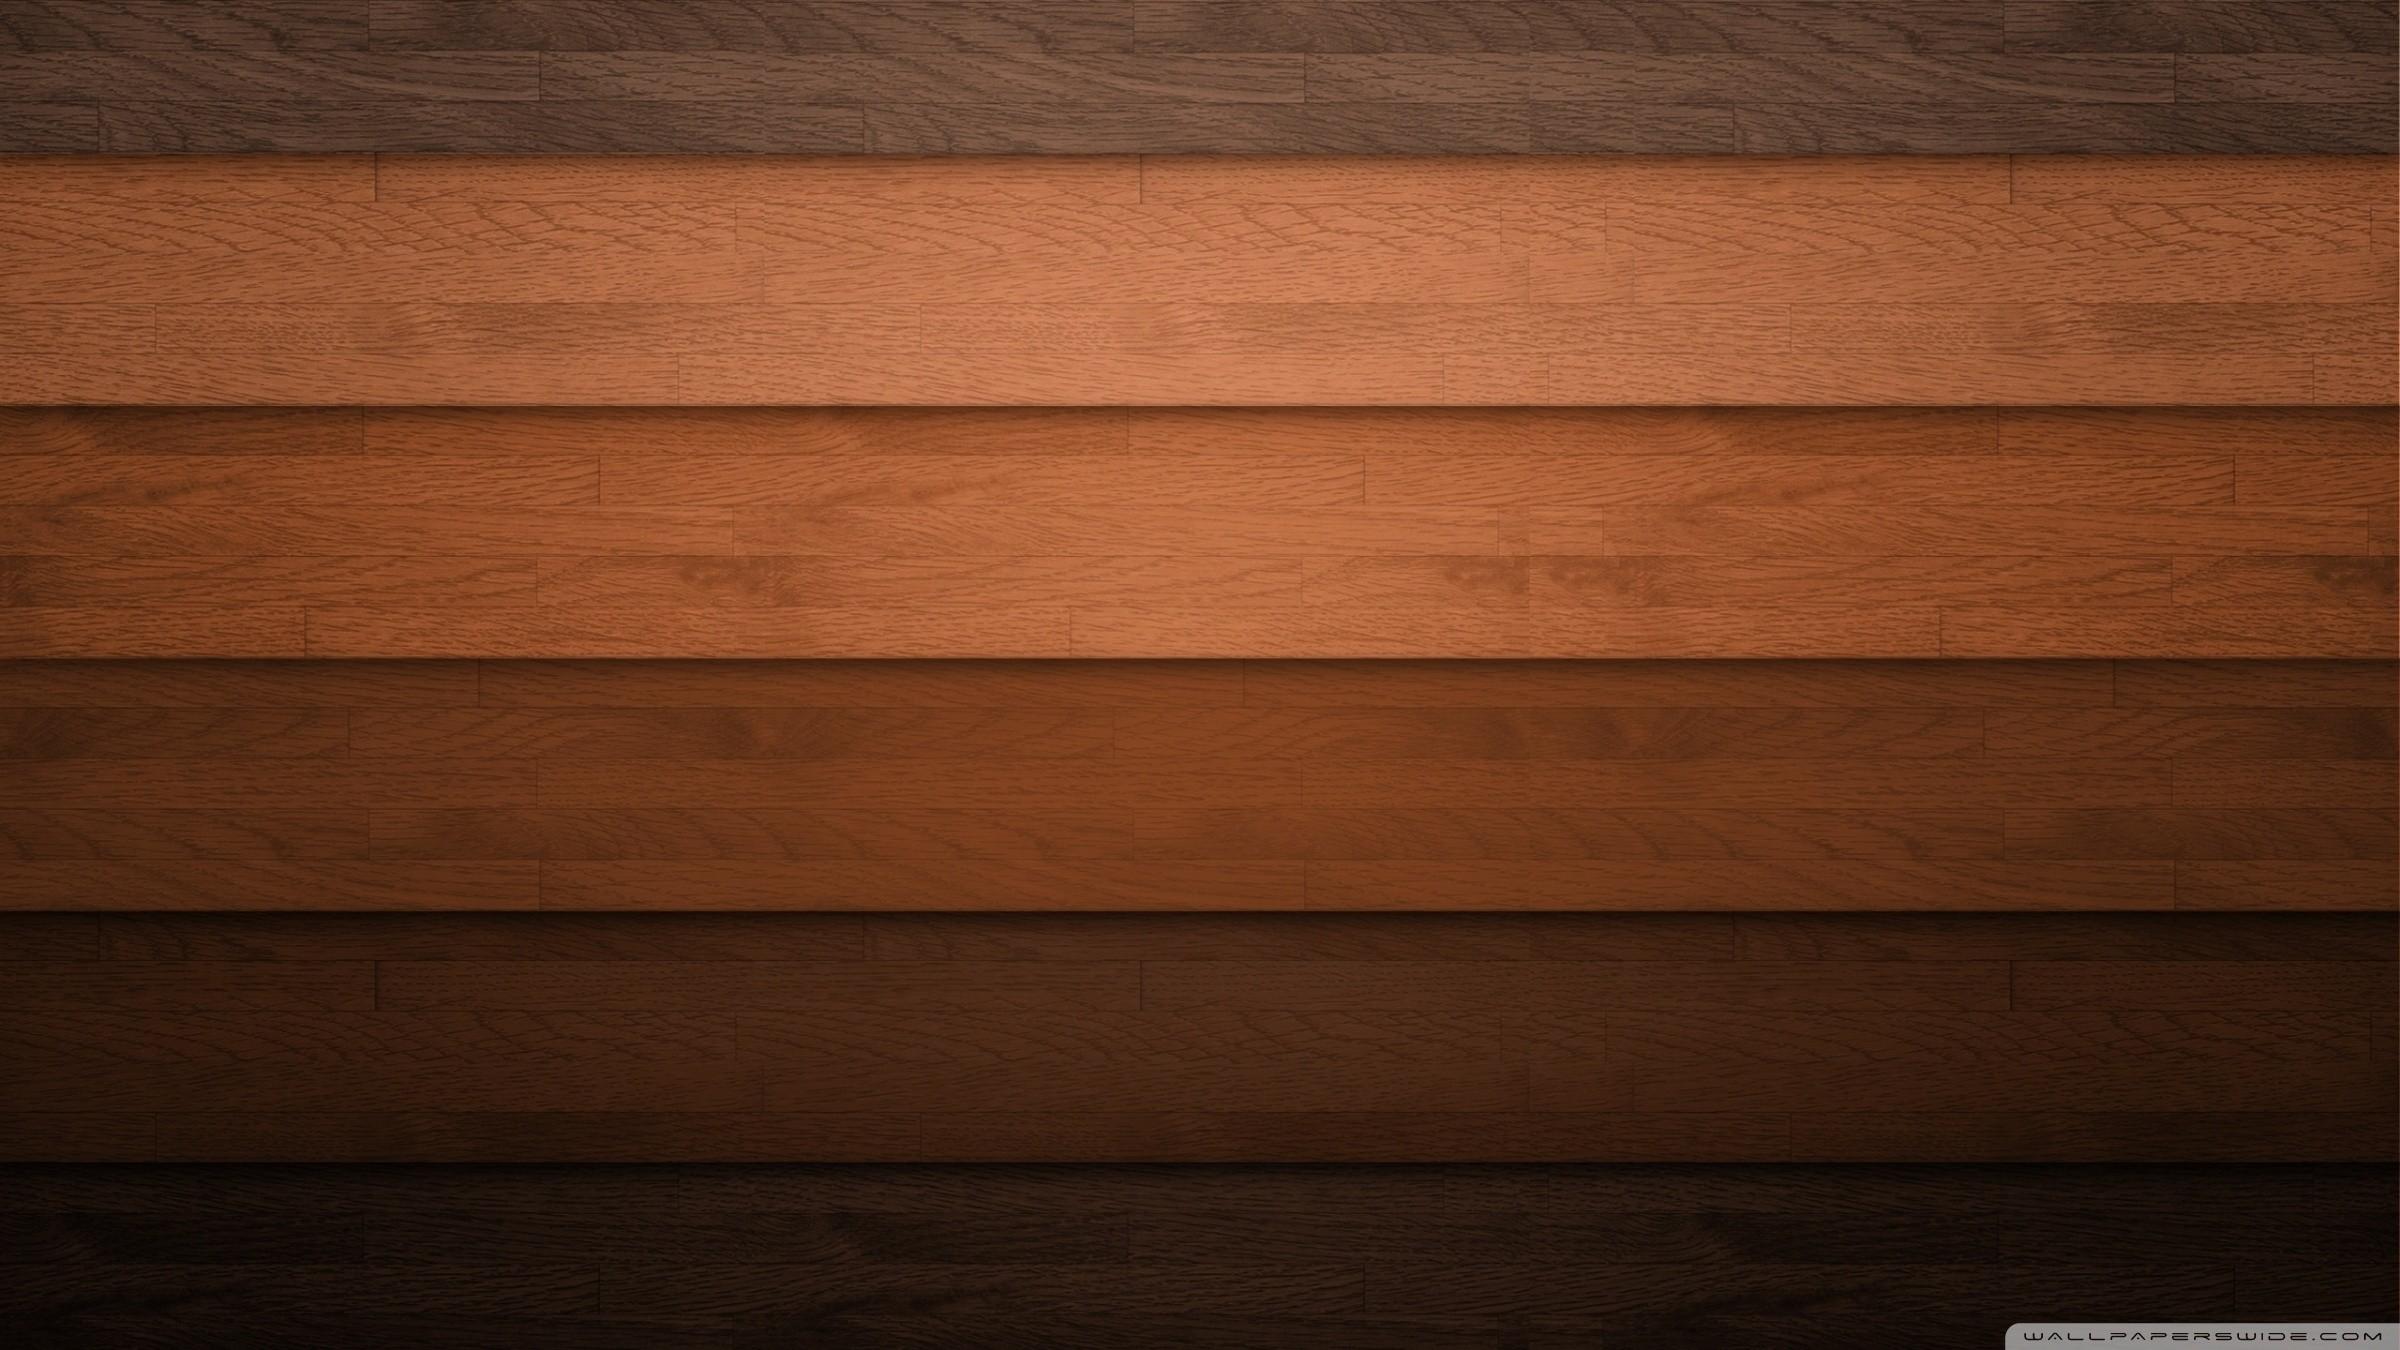 Wood Plank Pictures : Wood planks hd desktop wallpaper : high definition